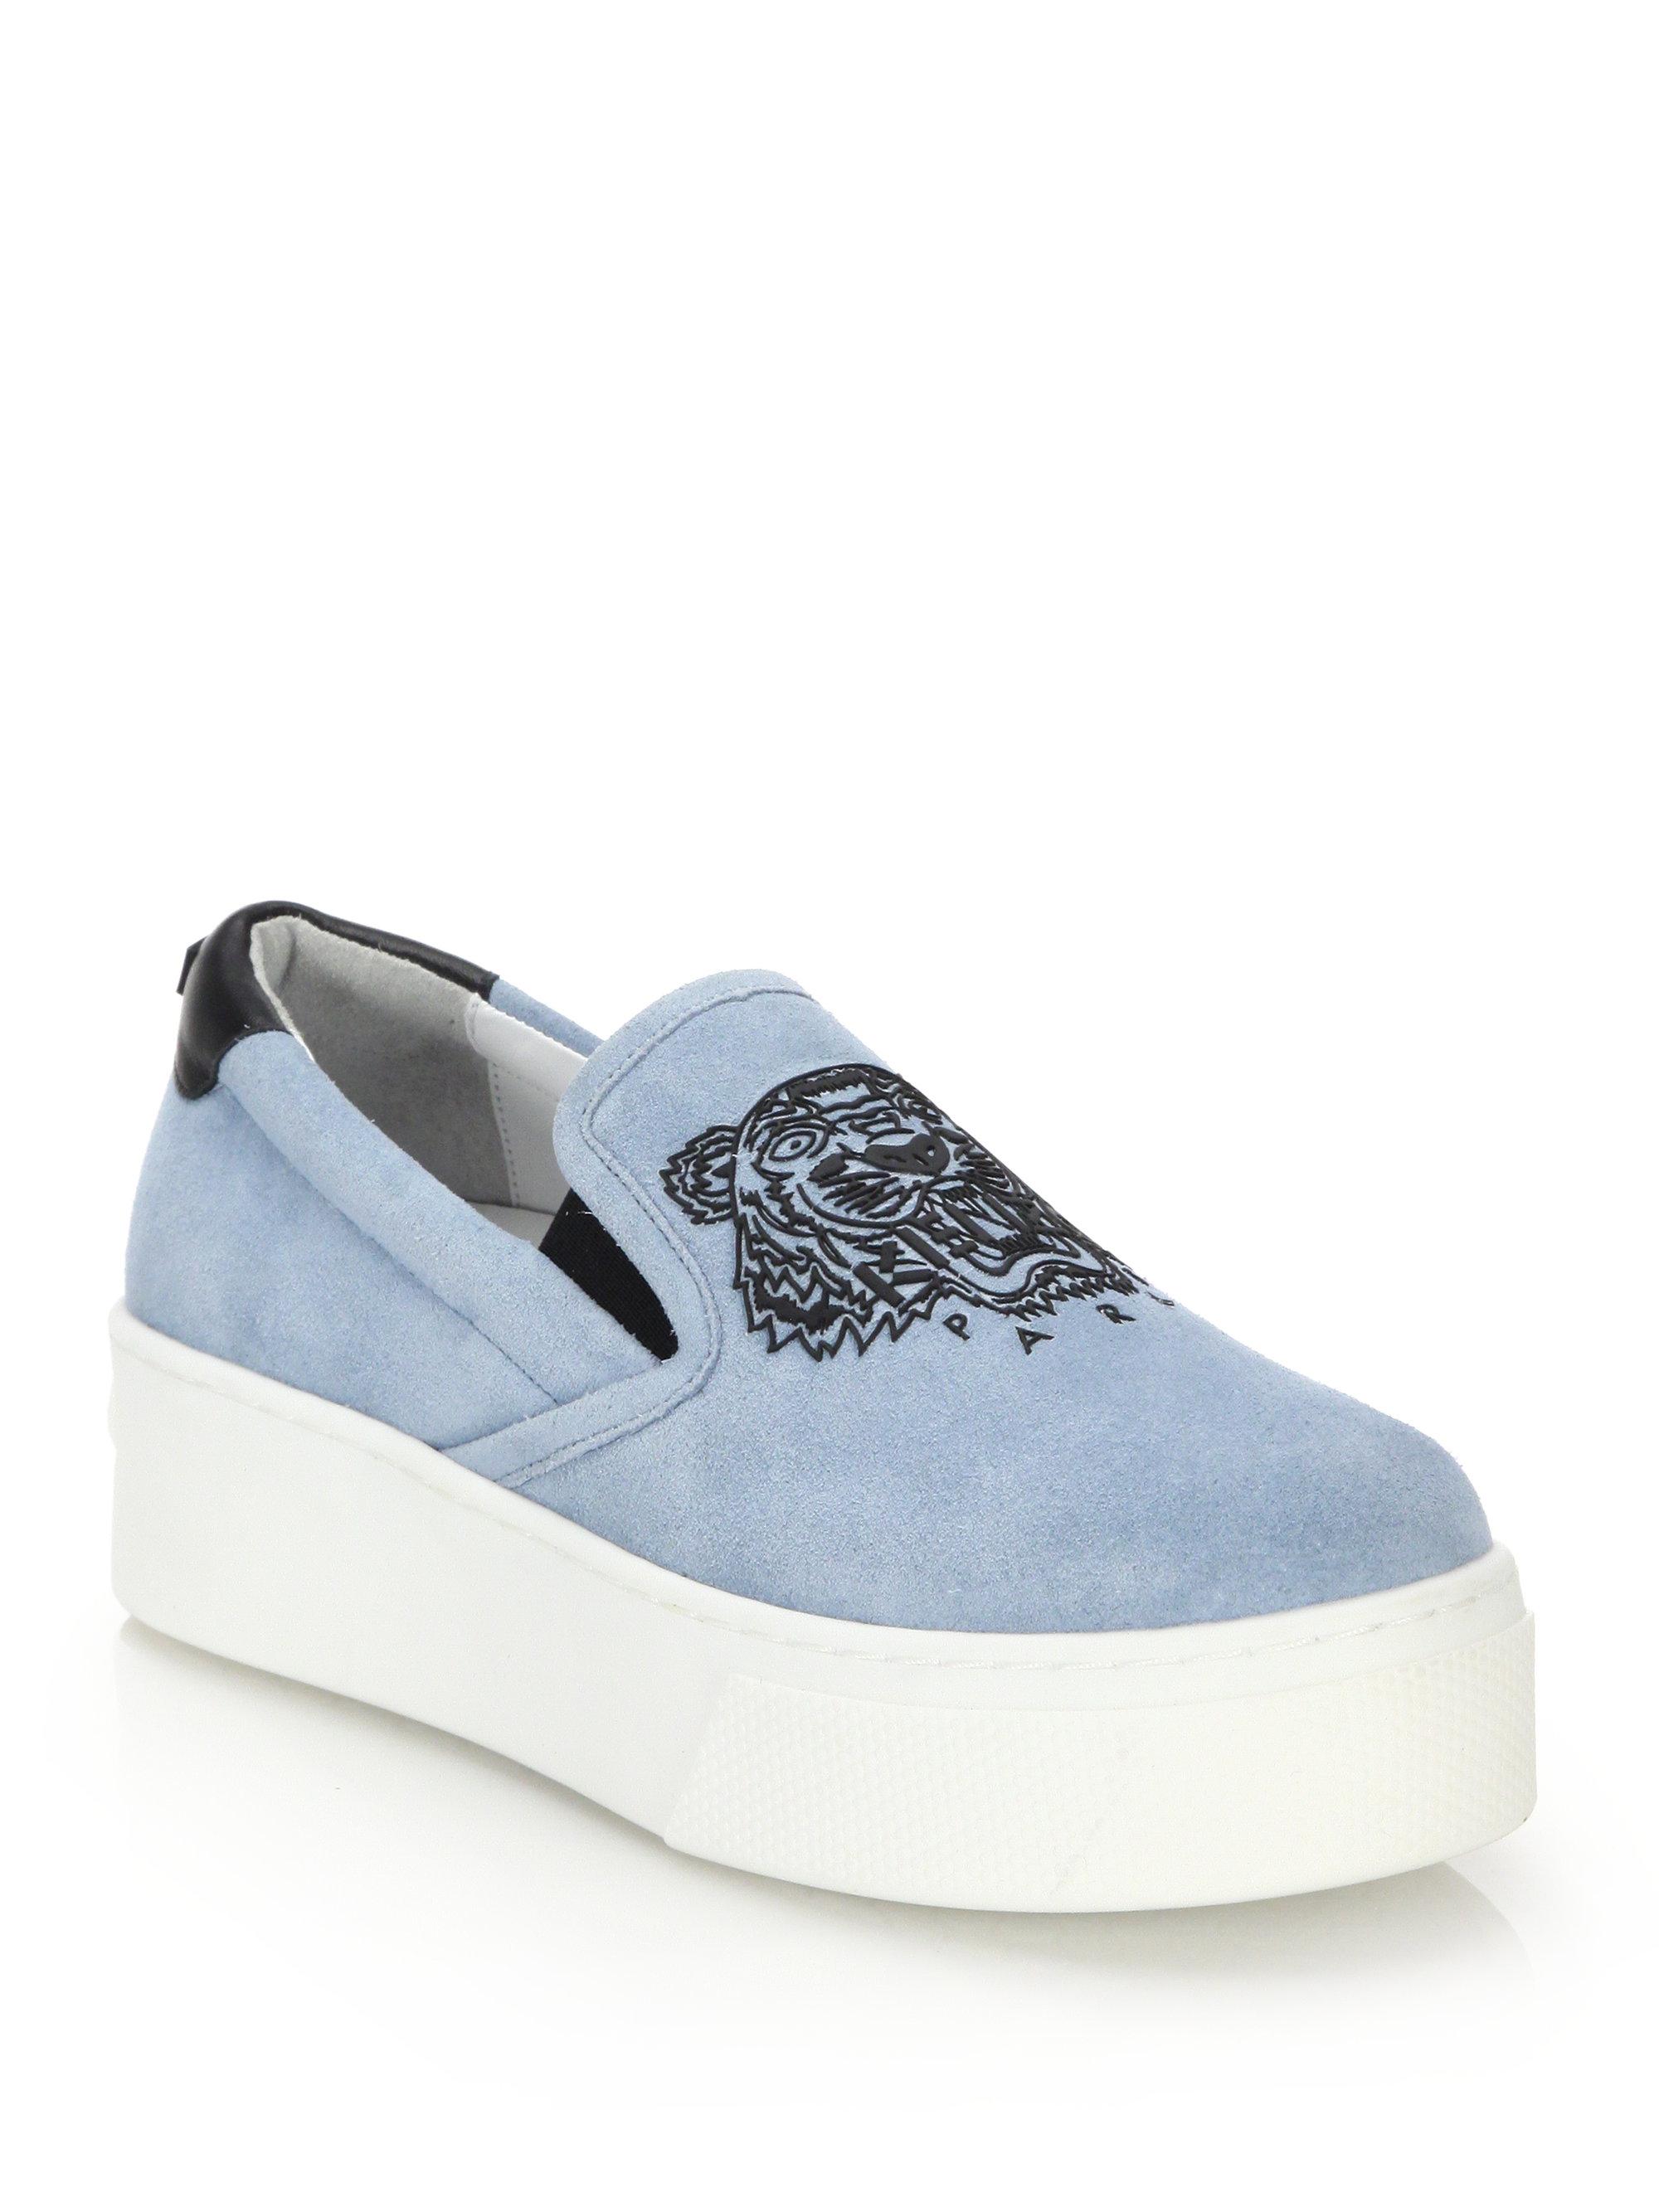 Low Suede Shoes Men Style